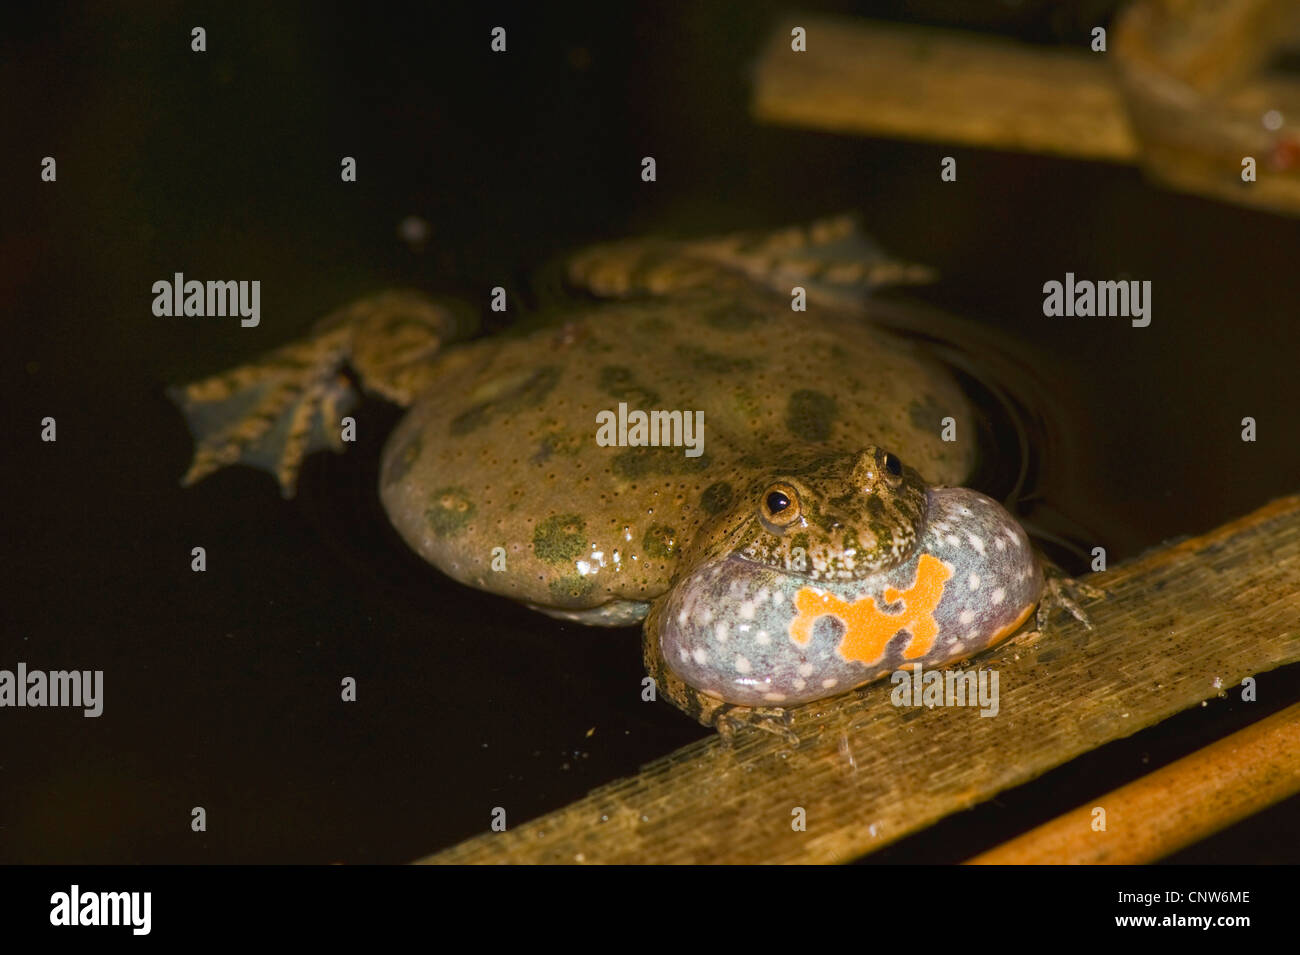 fire-bellied toad (Bombina bombina), croaking, Germany, Brandenburg - Stock Image